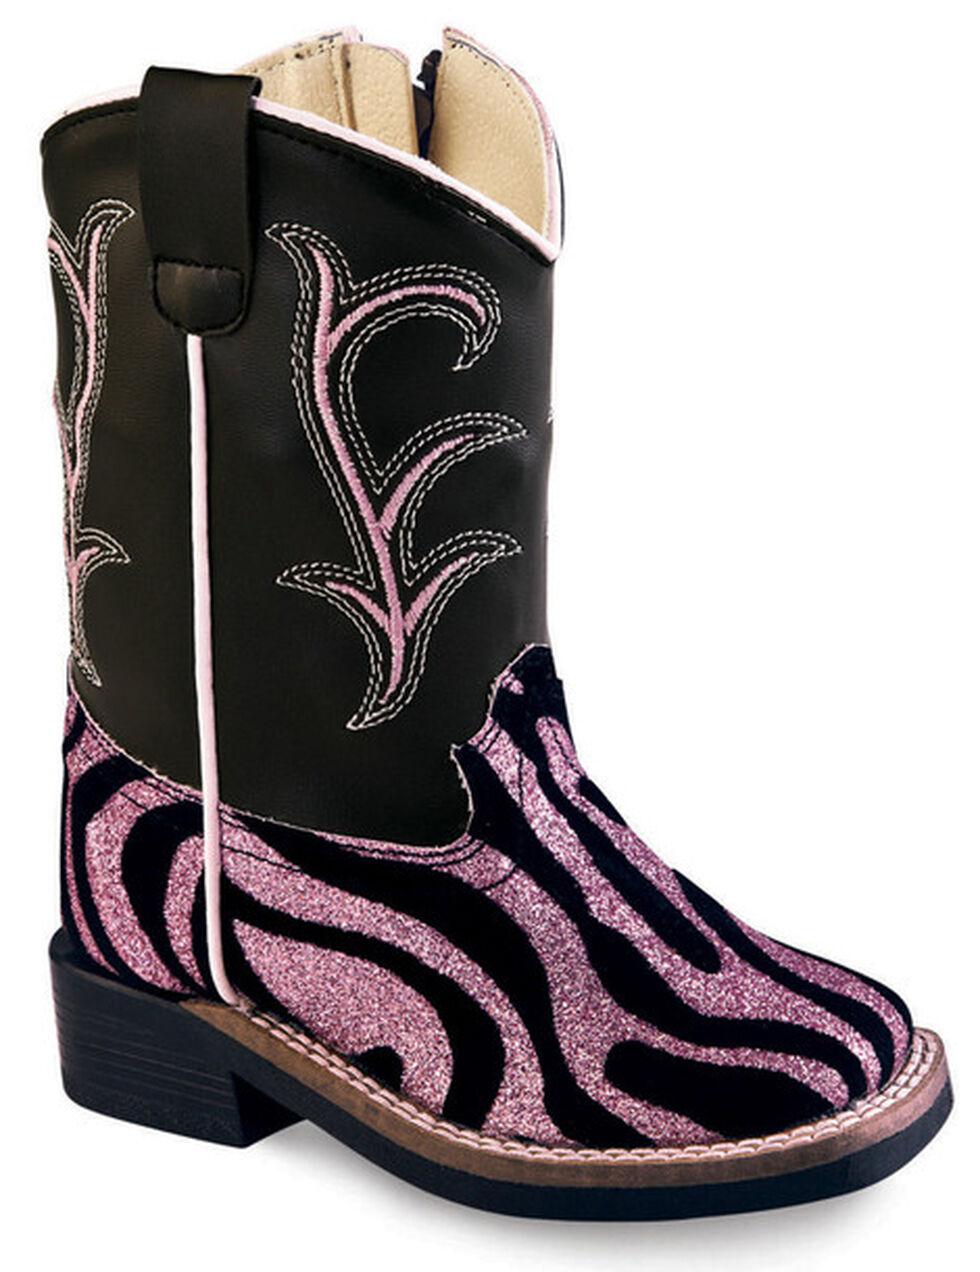 Old West Toddler Girls' Pink and Black Western Boots - Square Toe, Zebra, hi-res